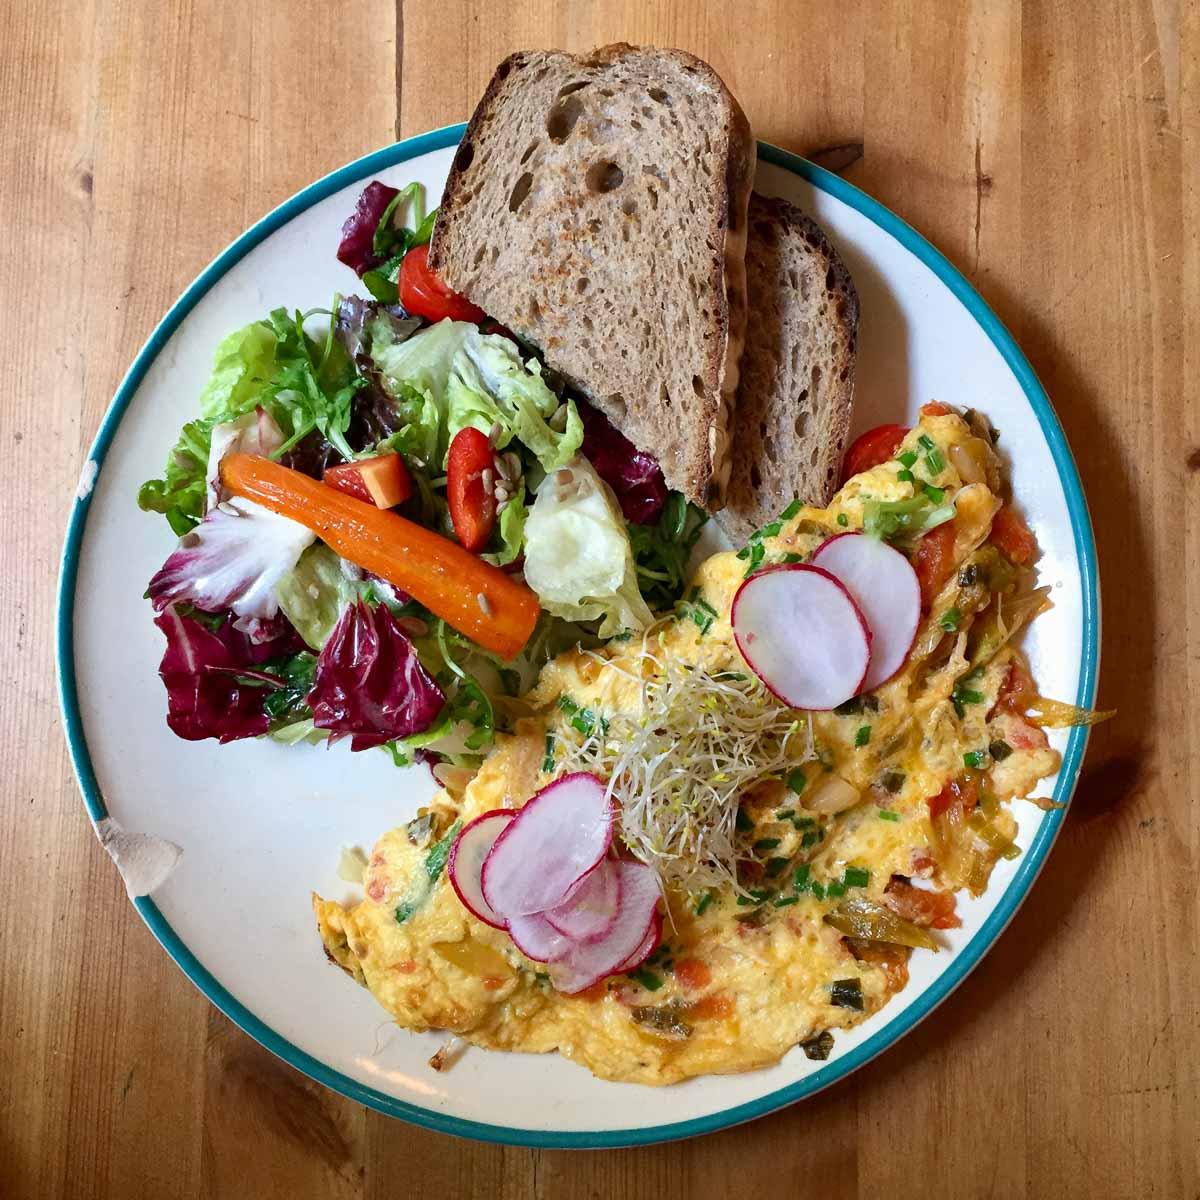 Neumanns Cafe Friedrichshain Omelette